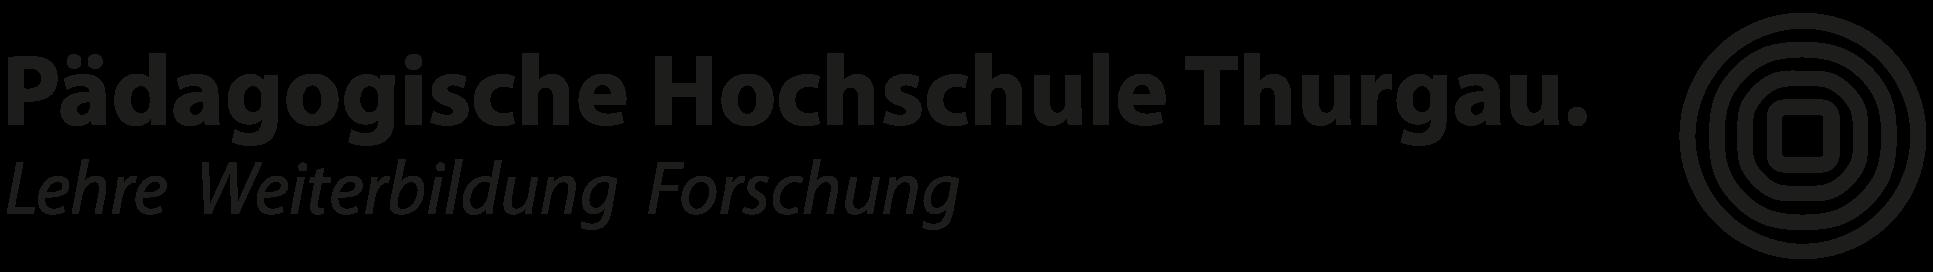 logo-phtg_2.png